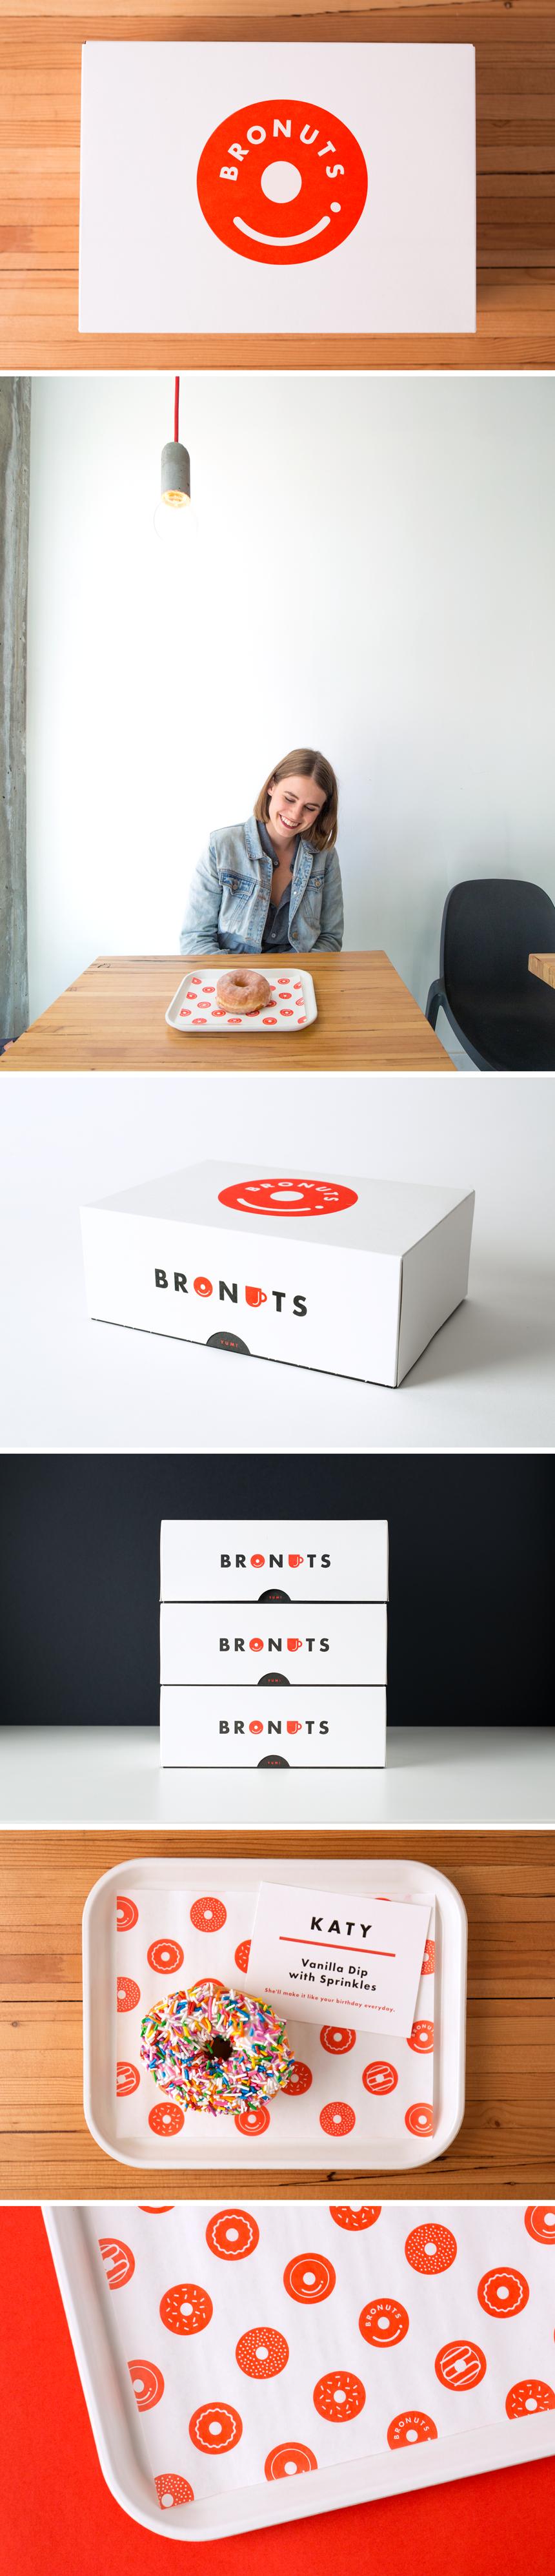 Bronuts - One Plus One Design